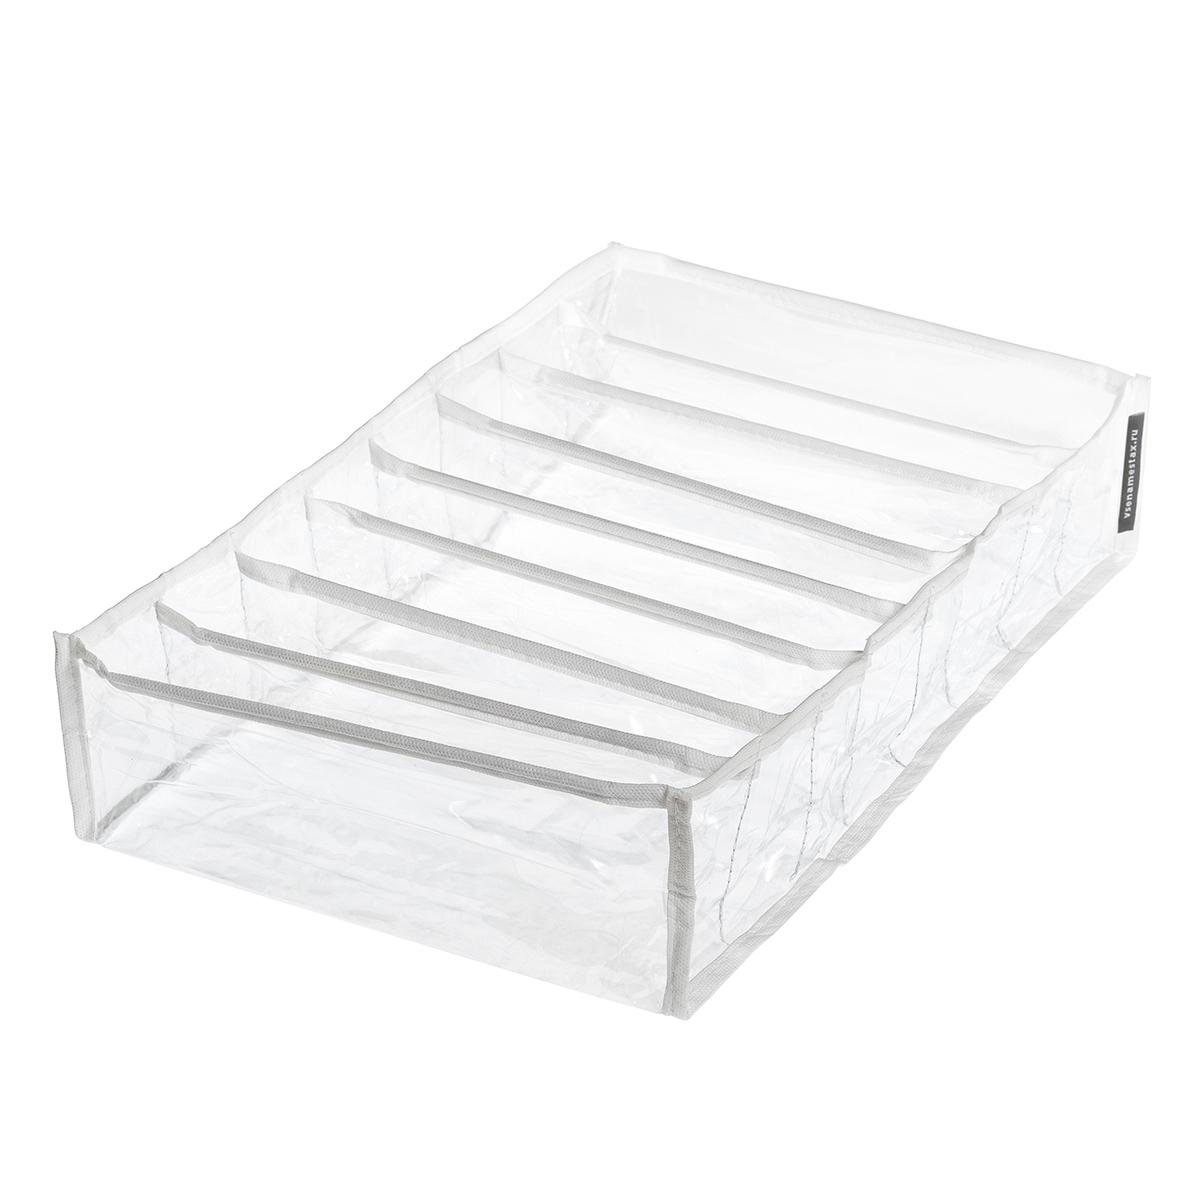 Органайзер прозрачный 40х25х10 см, 8 ячеек, Белый